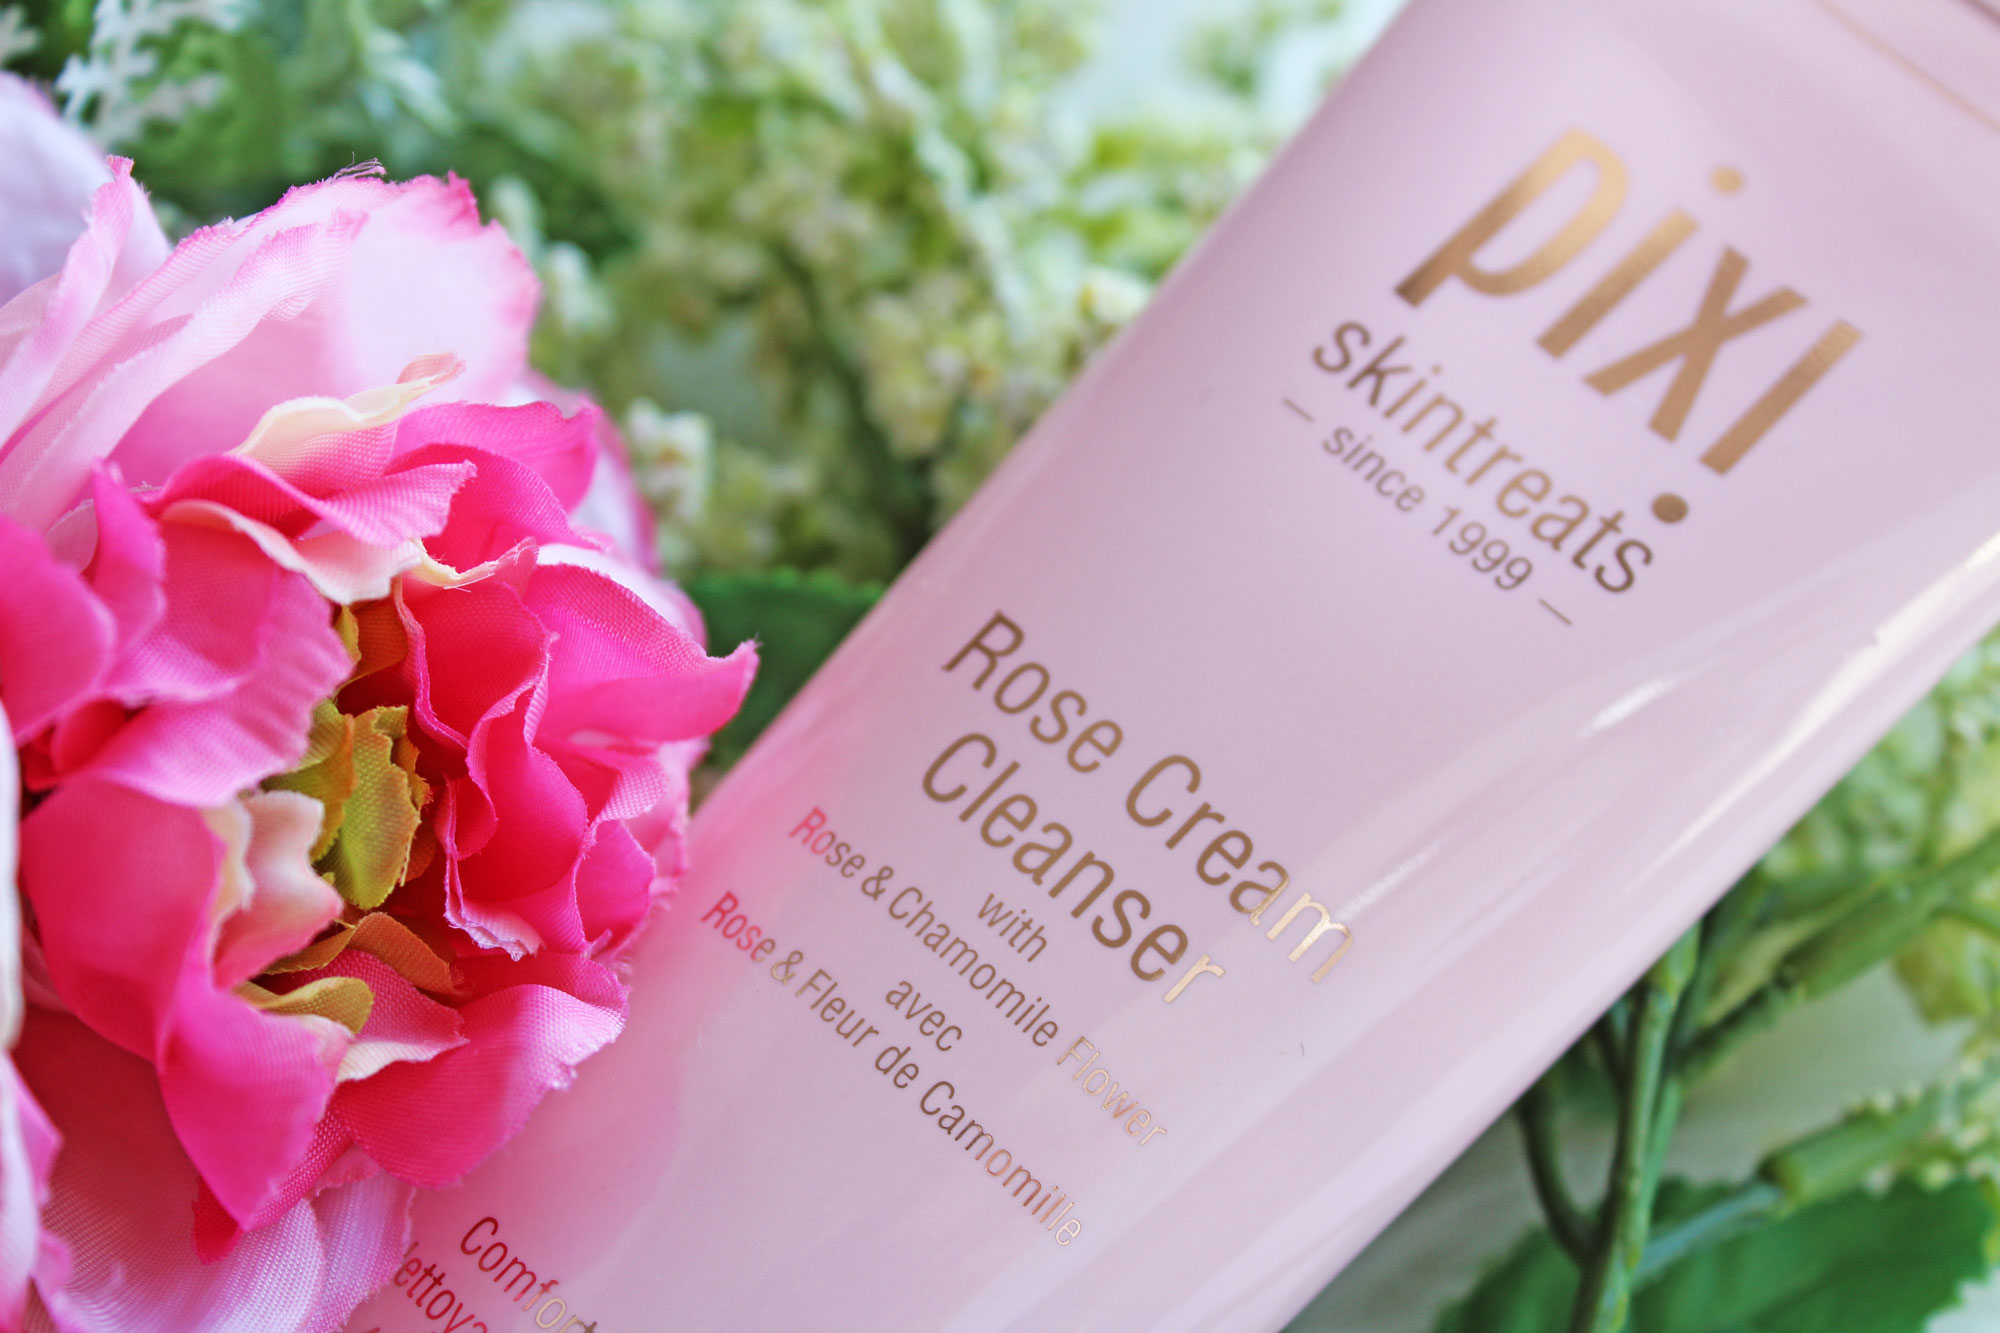 Pixi Beauty Rose Cream Cleanser